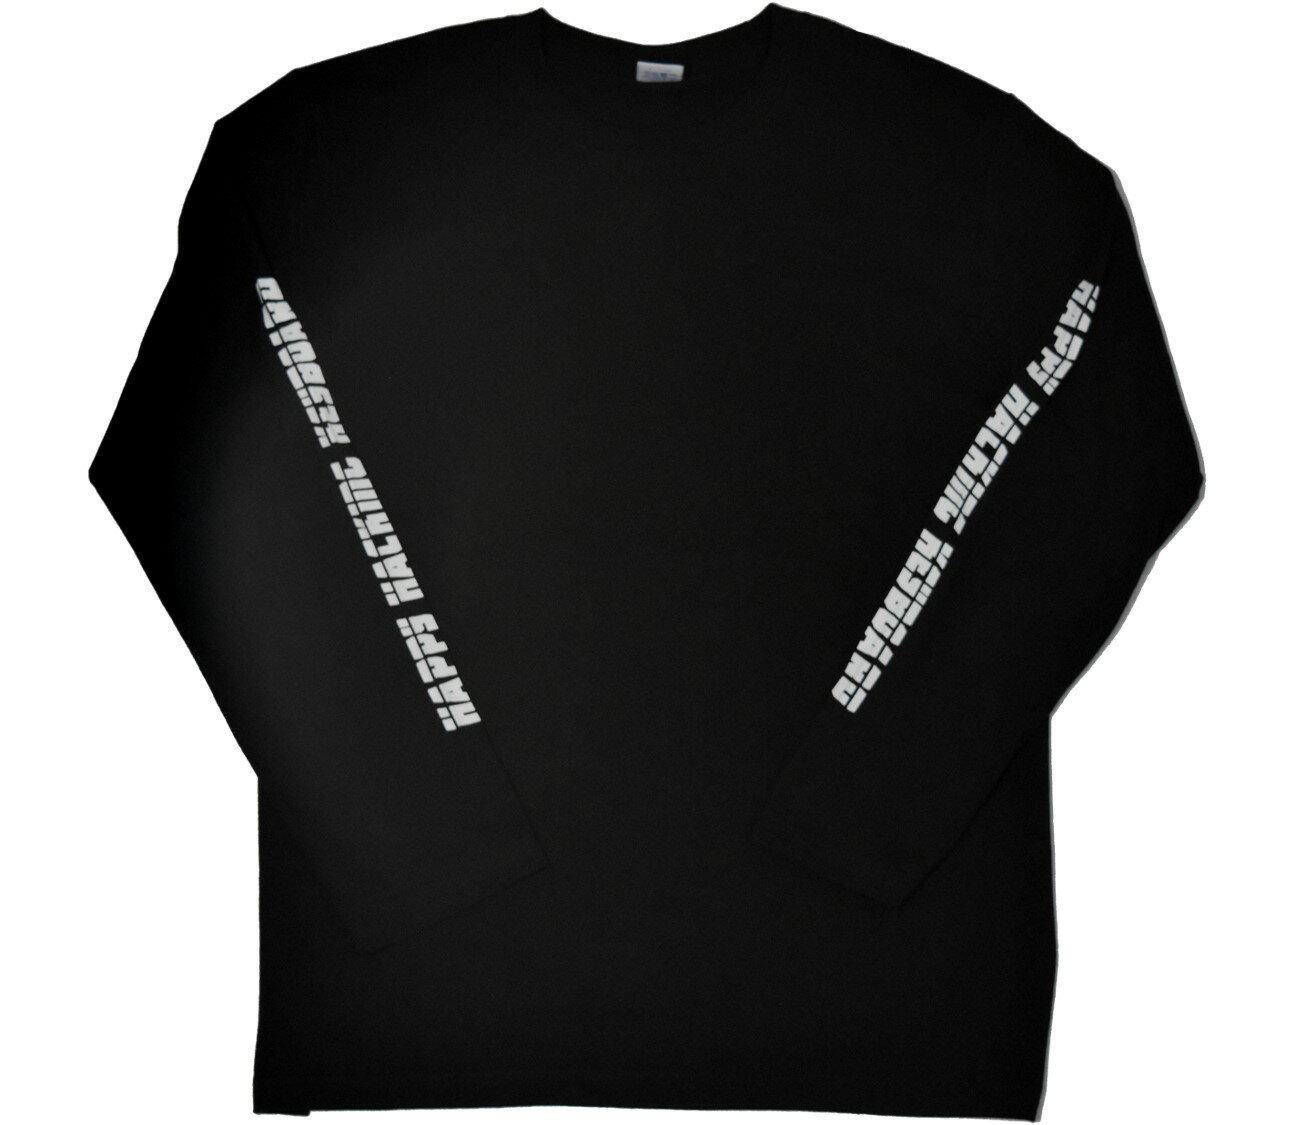 HHKB Tシャツ 長袖(M)画像